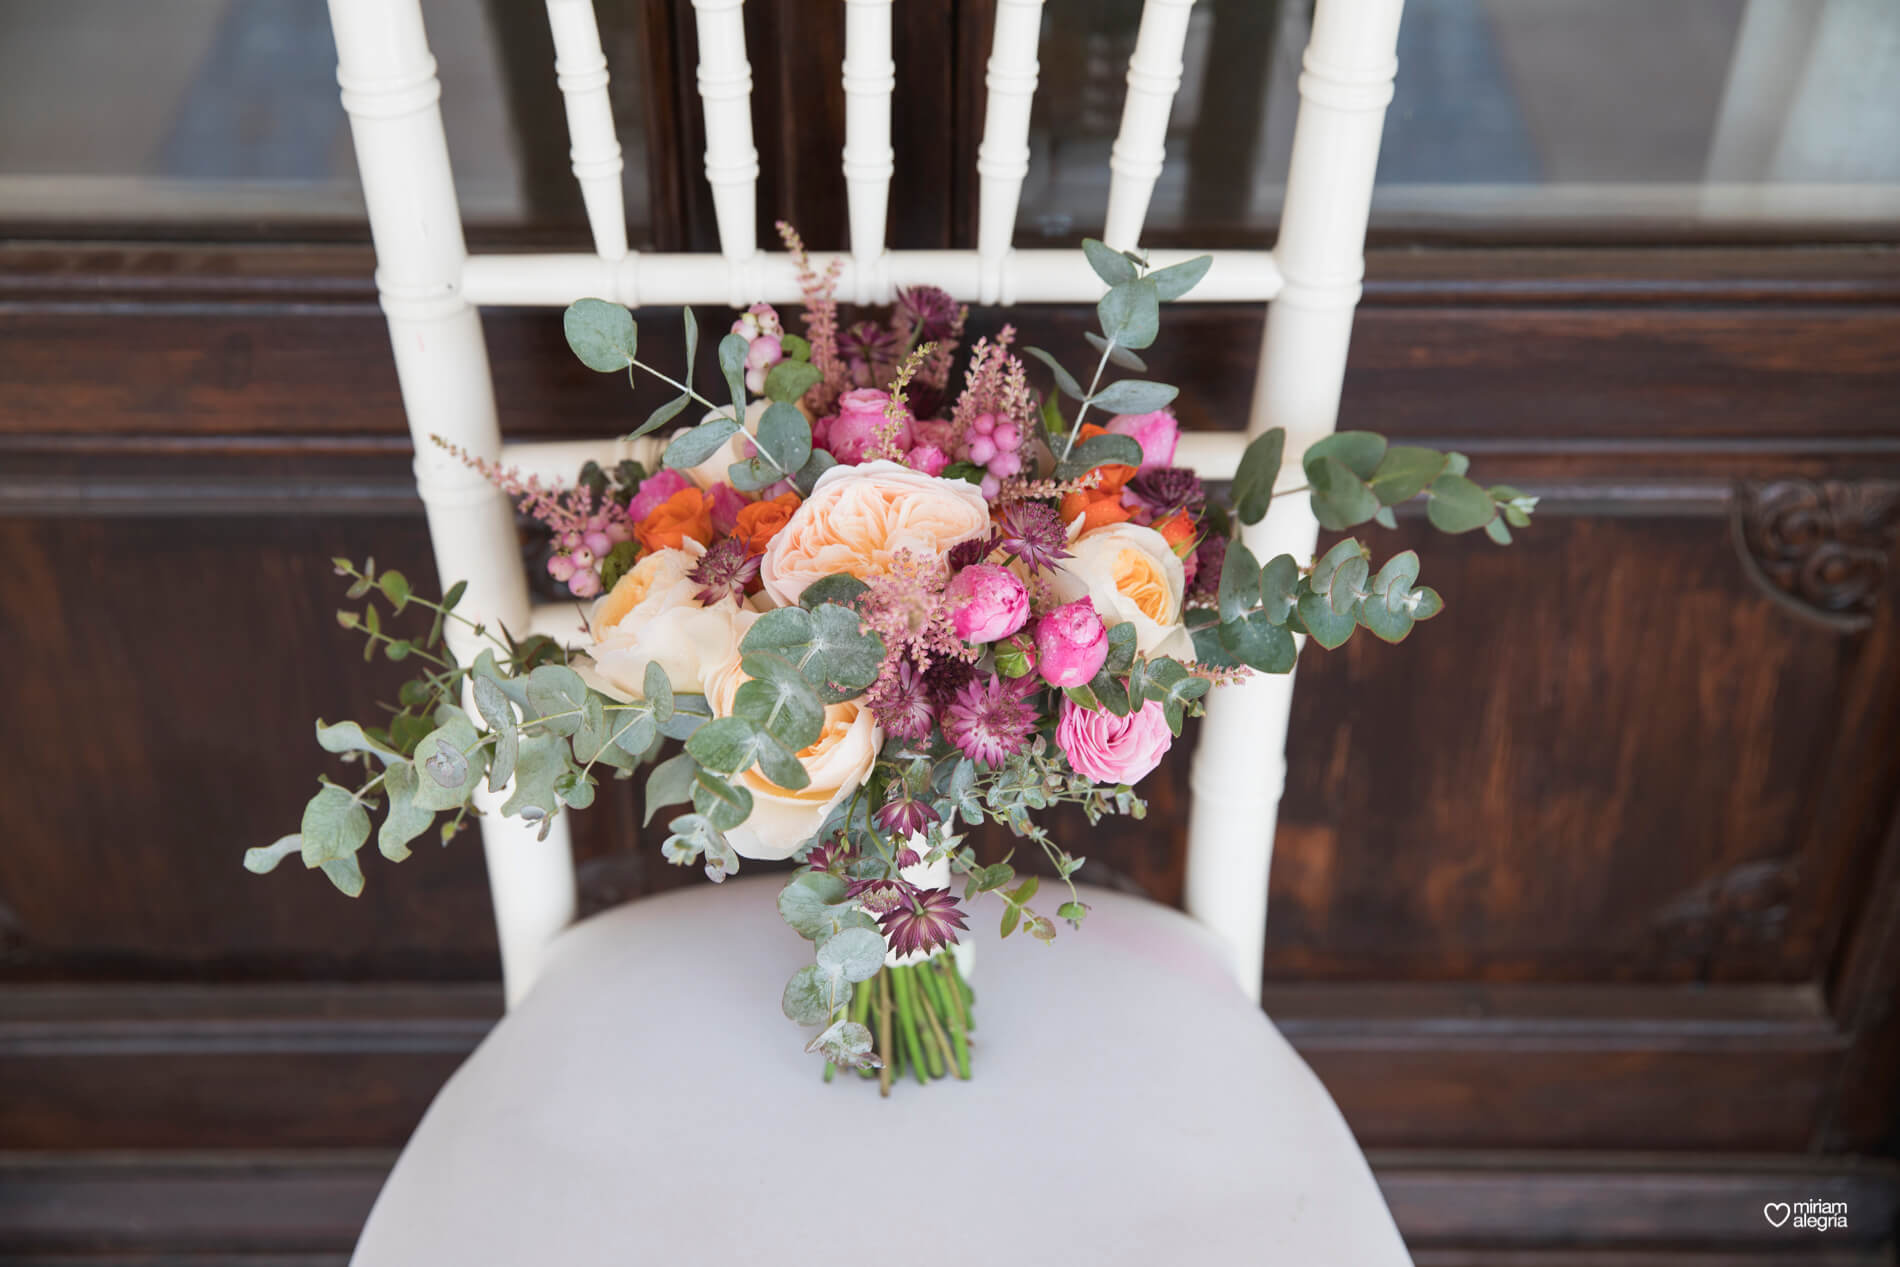 la-boda-de-alemc7-miriam-alegria-fotografos-boda-murcia-15